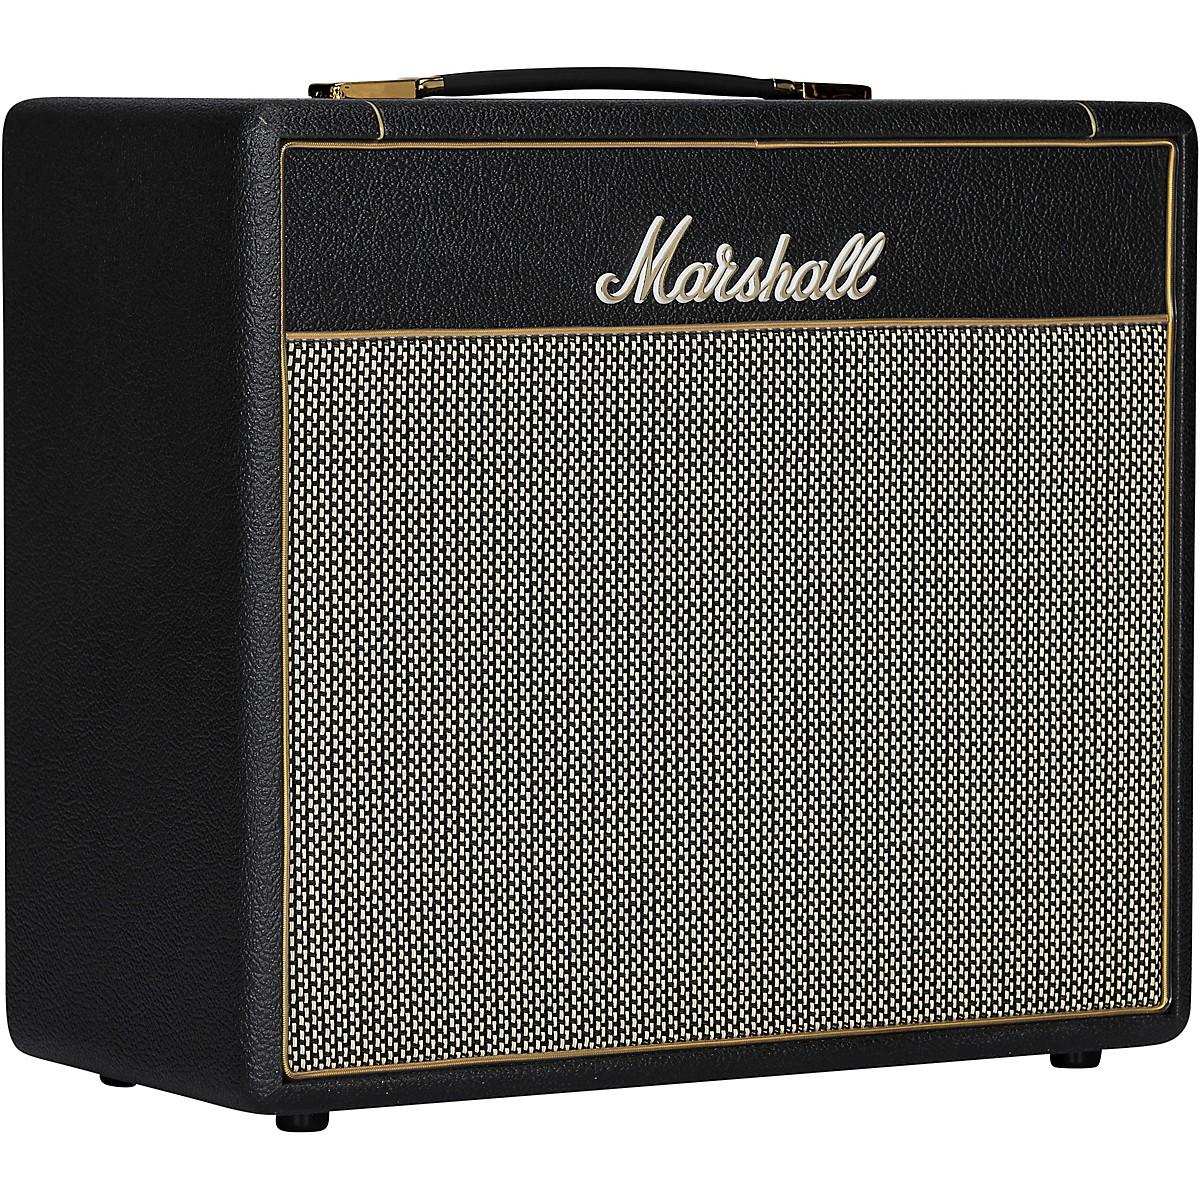 Marshall Studio Vintage 20W 1x10 Tube Guitar Combo Amp